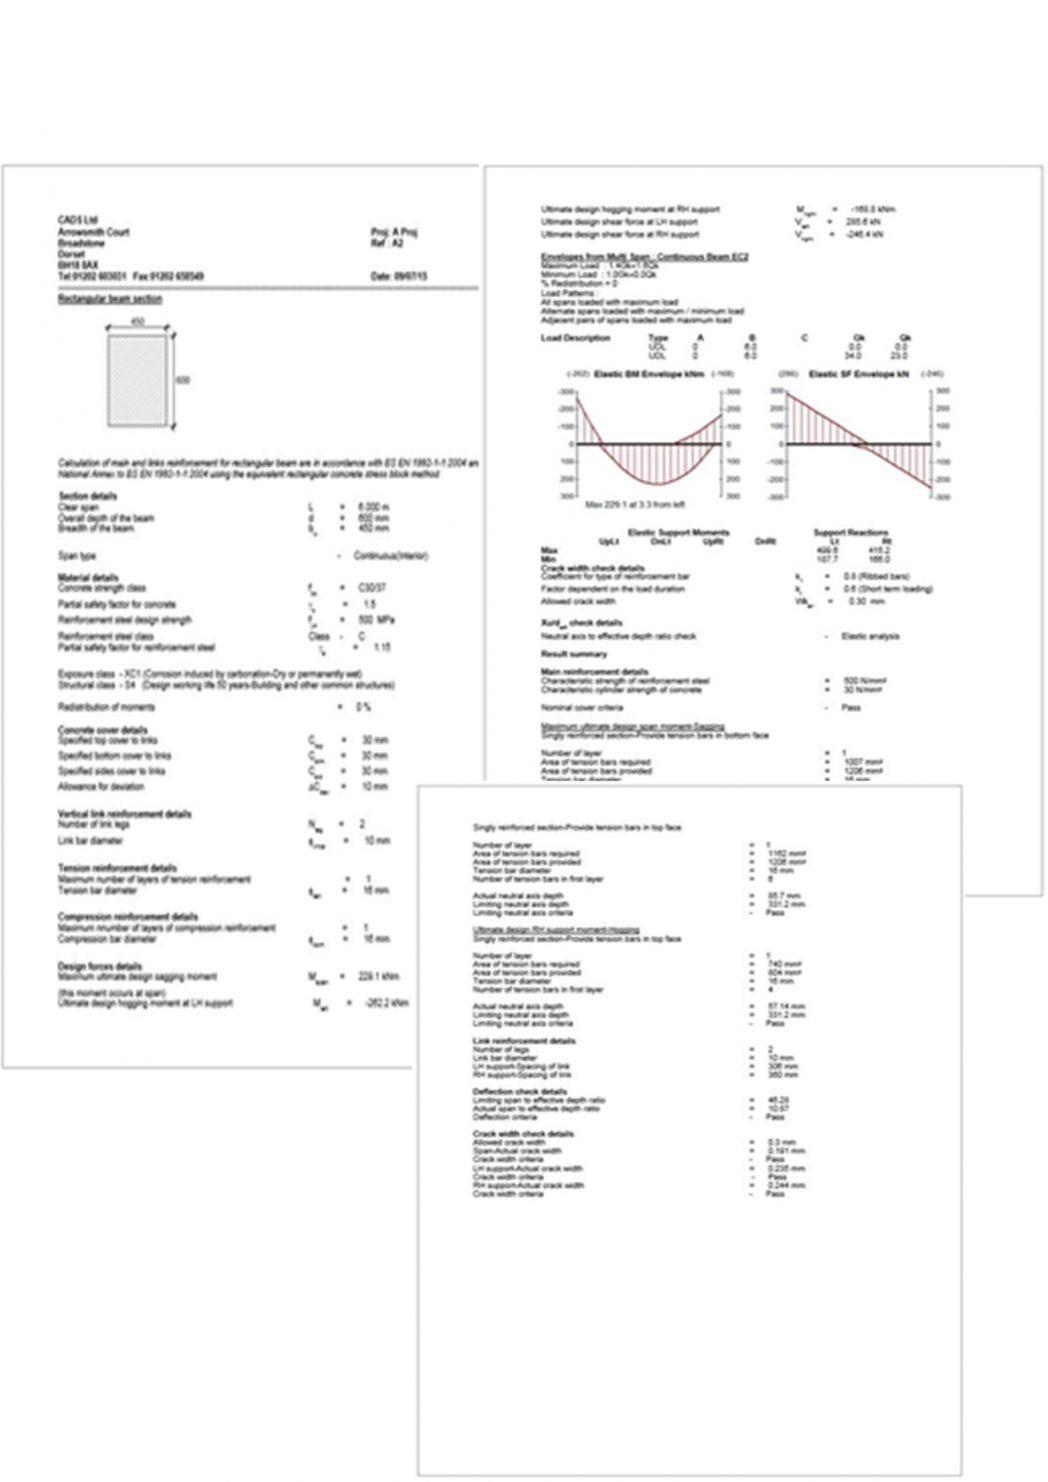 Pile Cap Design Spreadsheet Intended For Smart Engineer 100S Of Calculation Templates Cads Uk Pile Cap Design